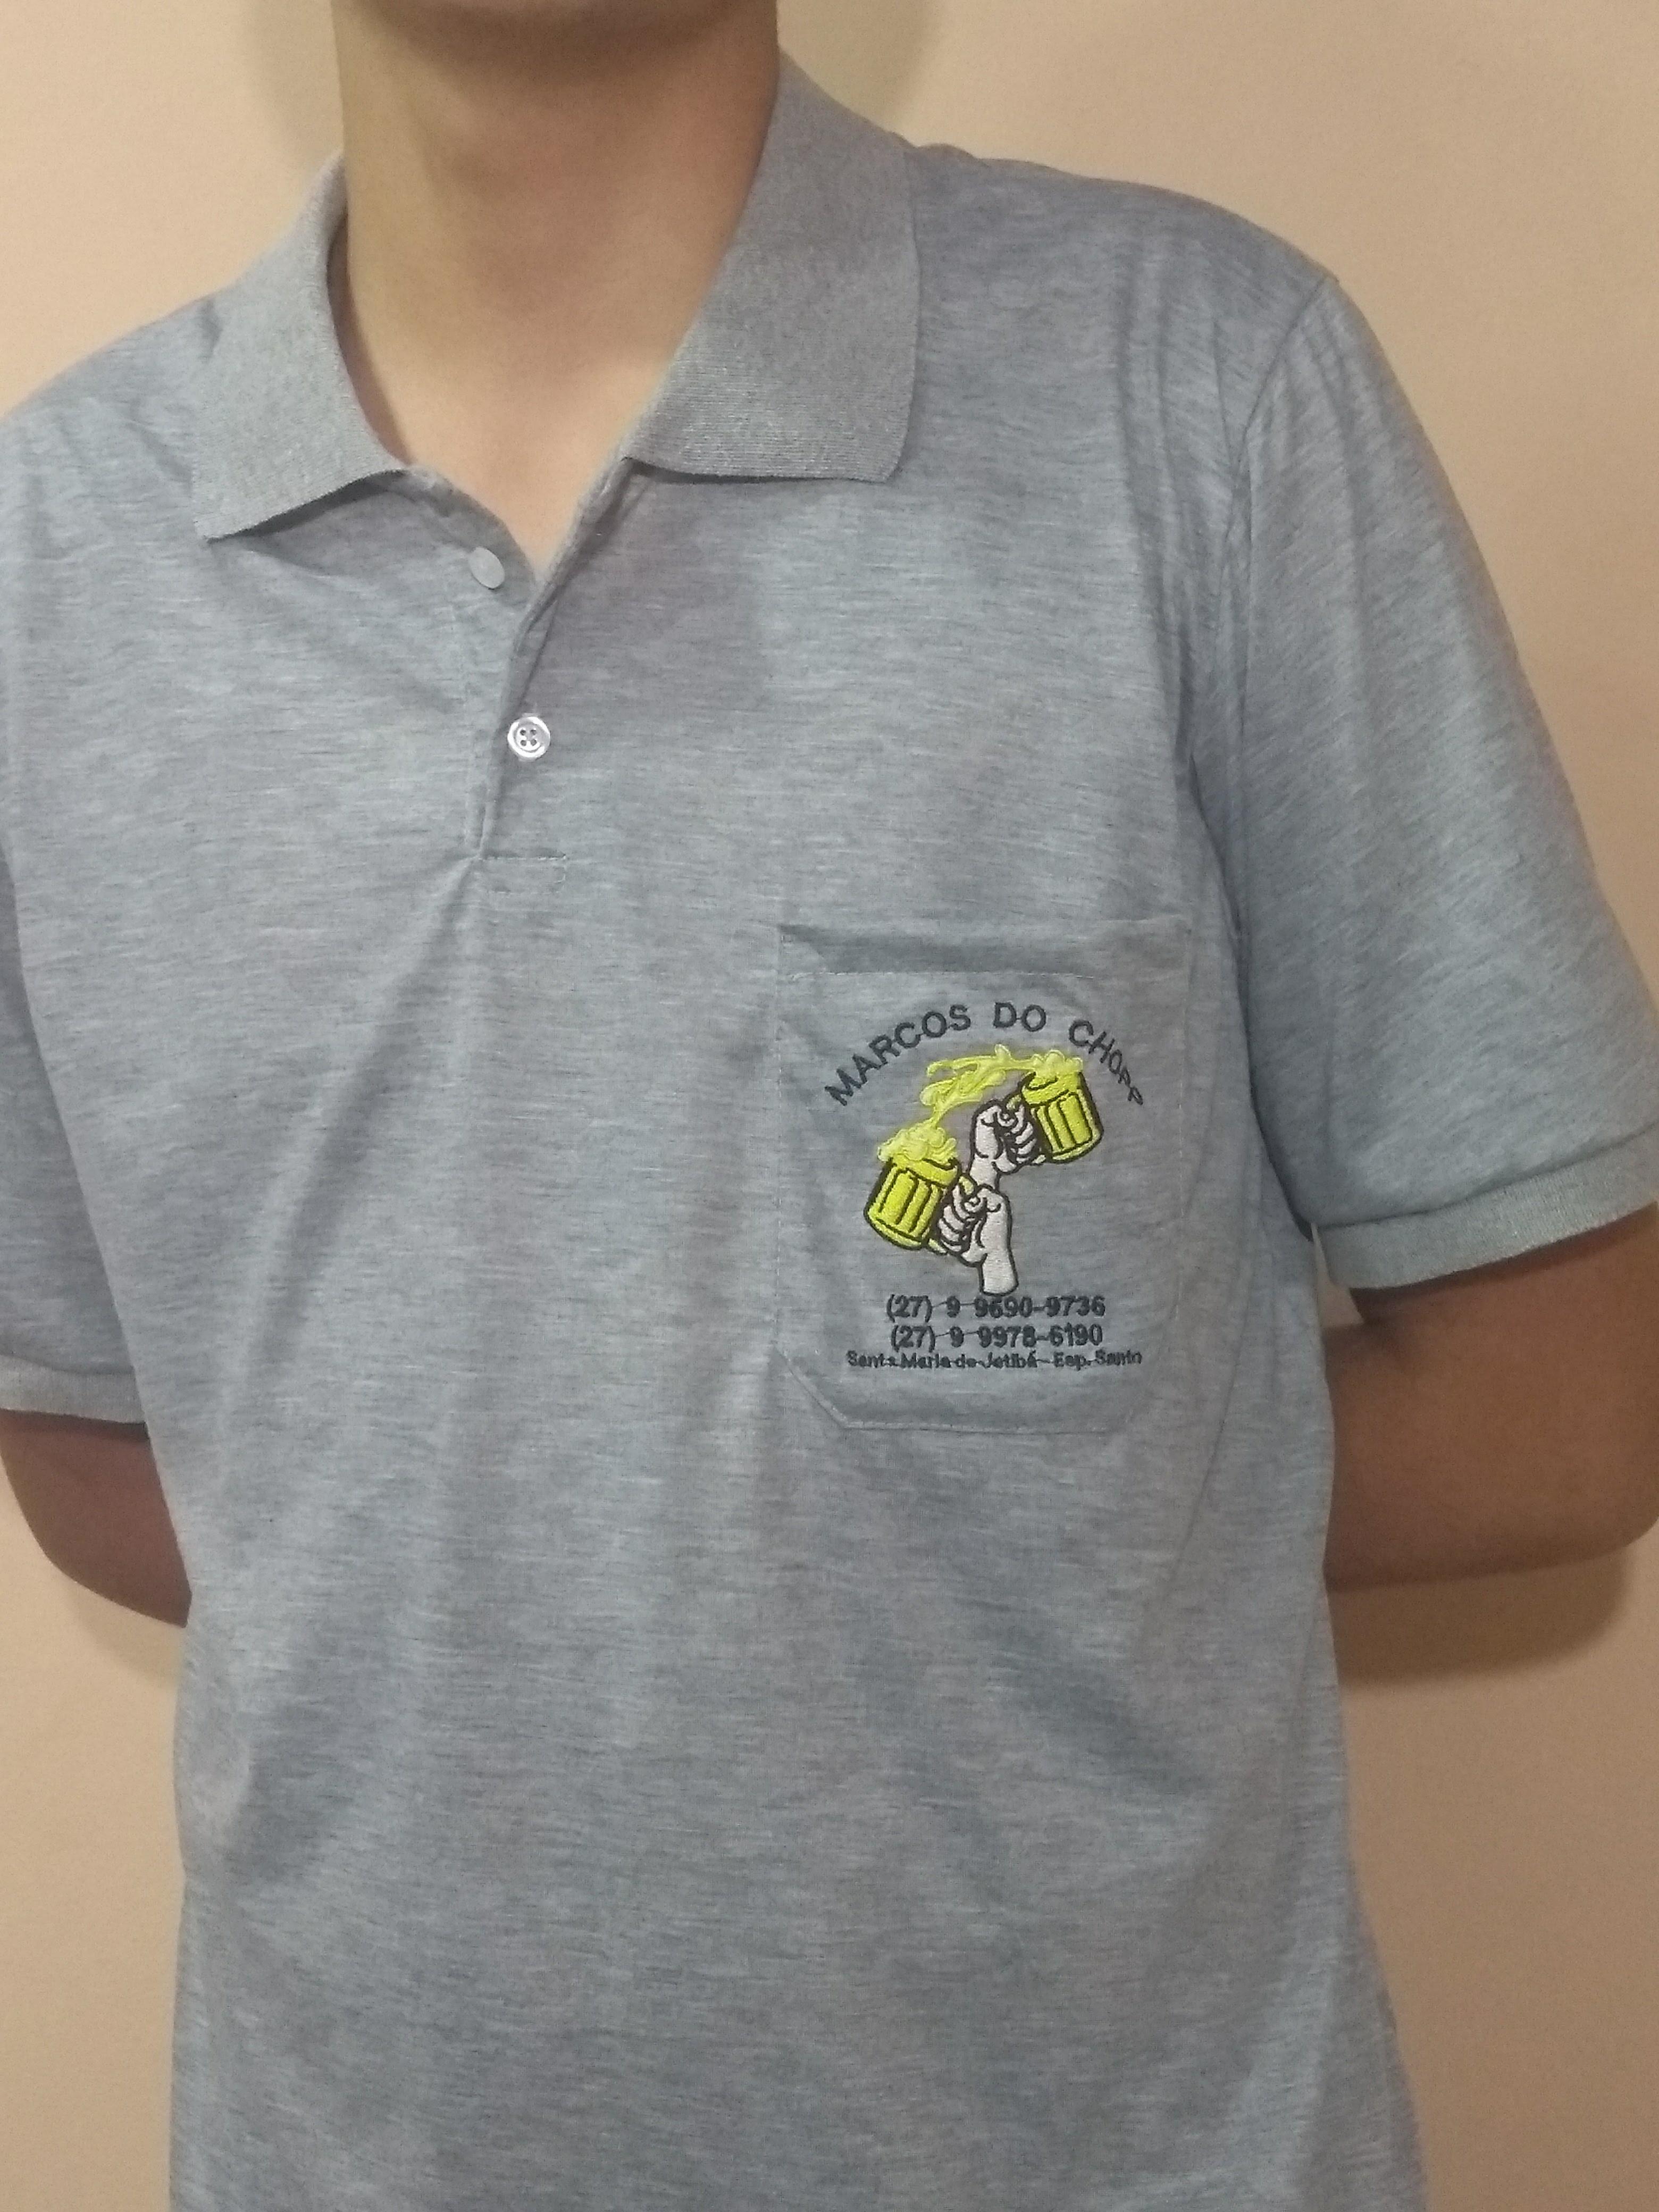 3917fdd45 Uniforme Profissional Camisa polo personalizada e bordada no Elo7 ...